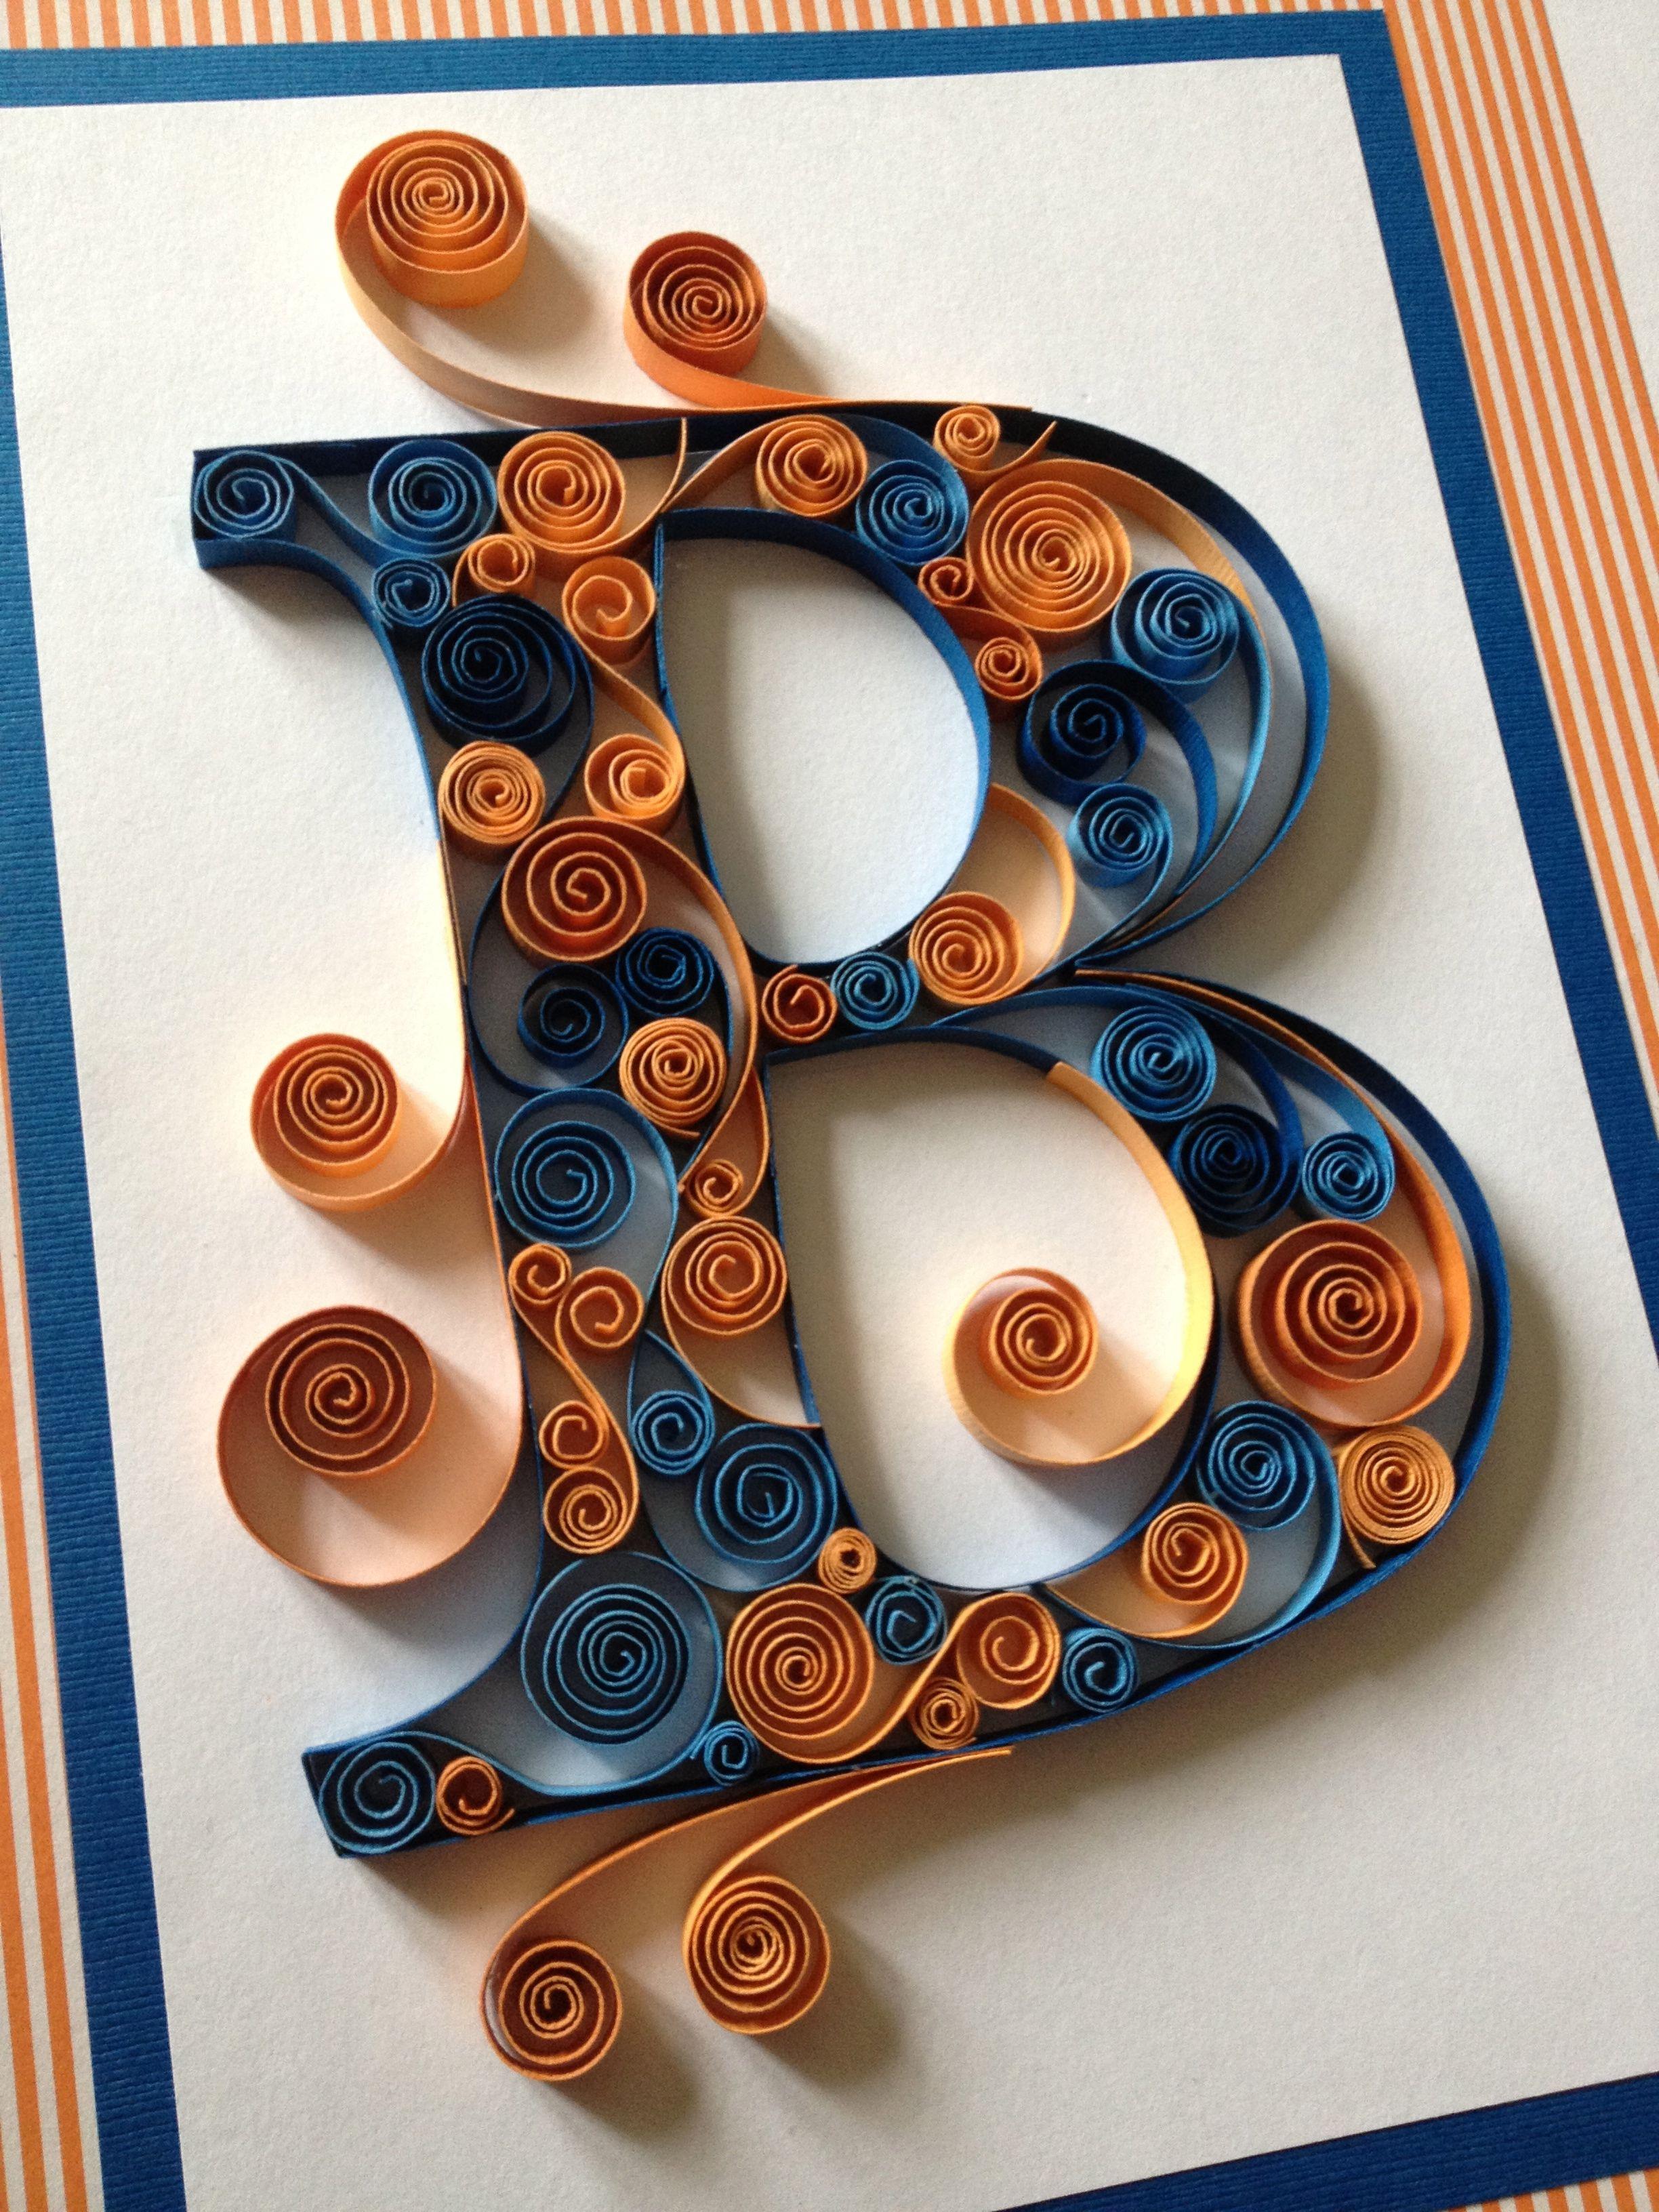 b74c4d8e999cadda7b1e1e853af5a297 Quilling Letter B Template on